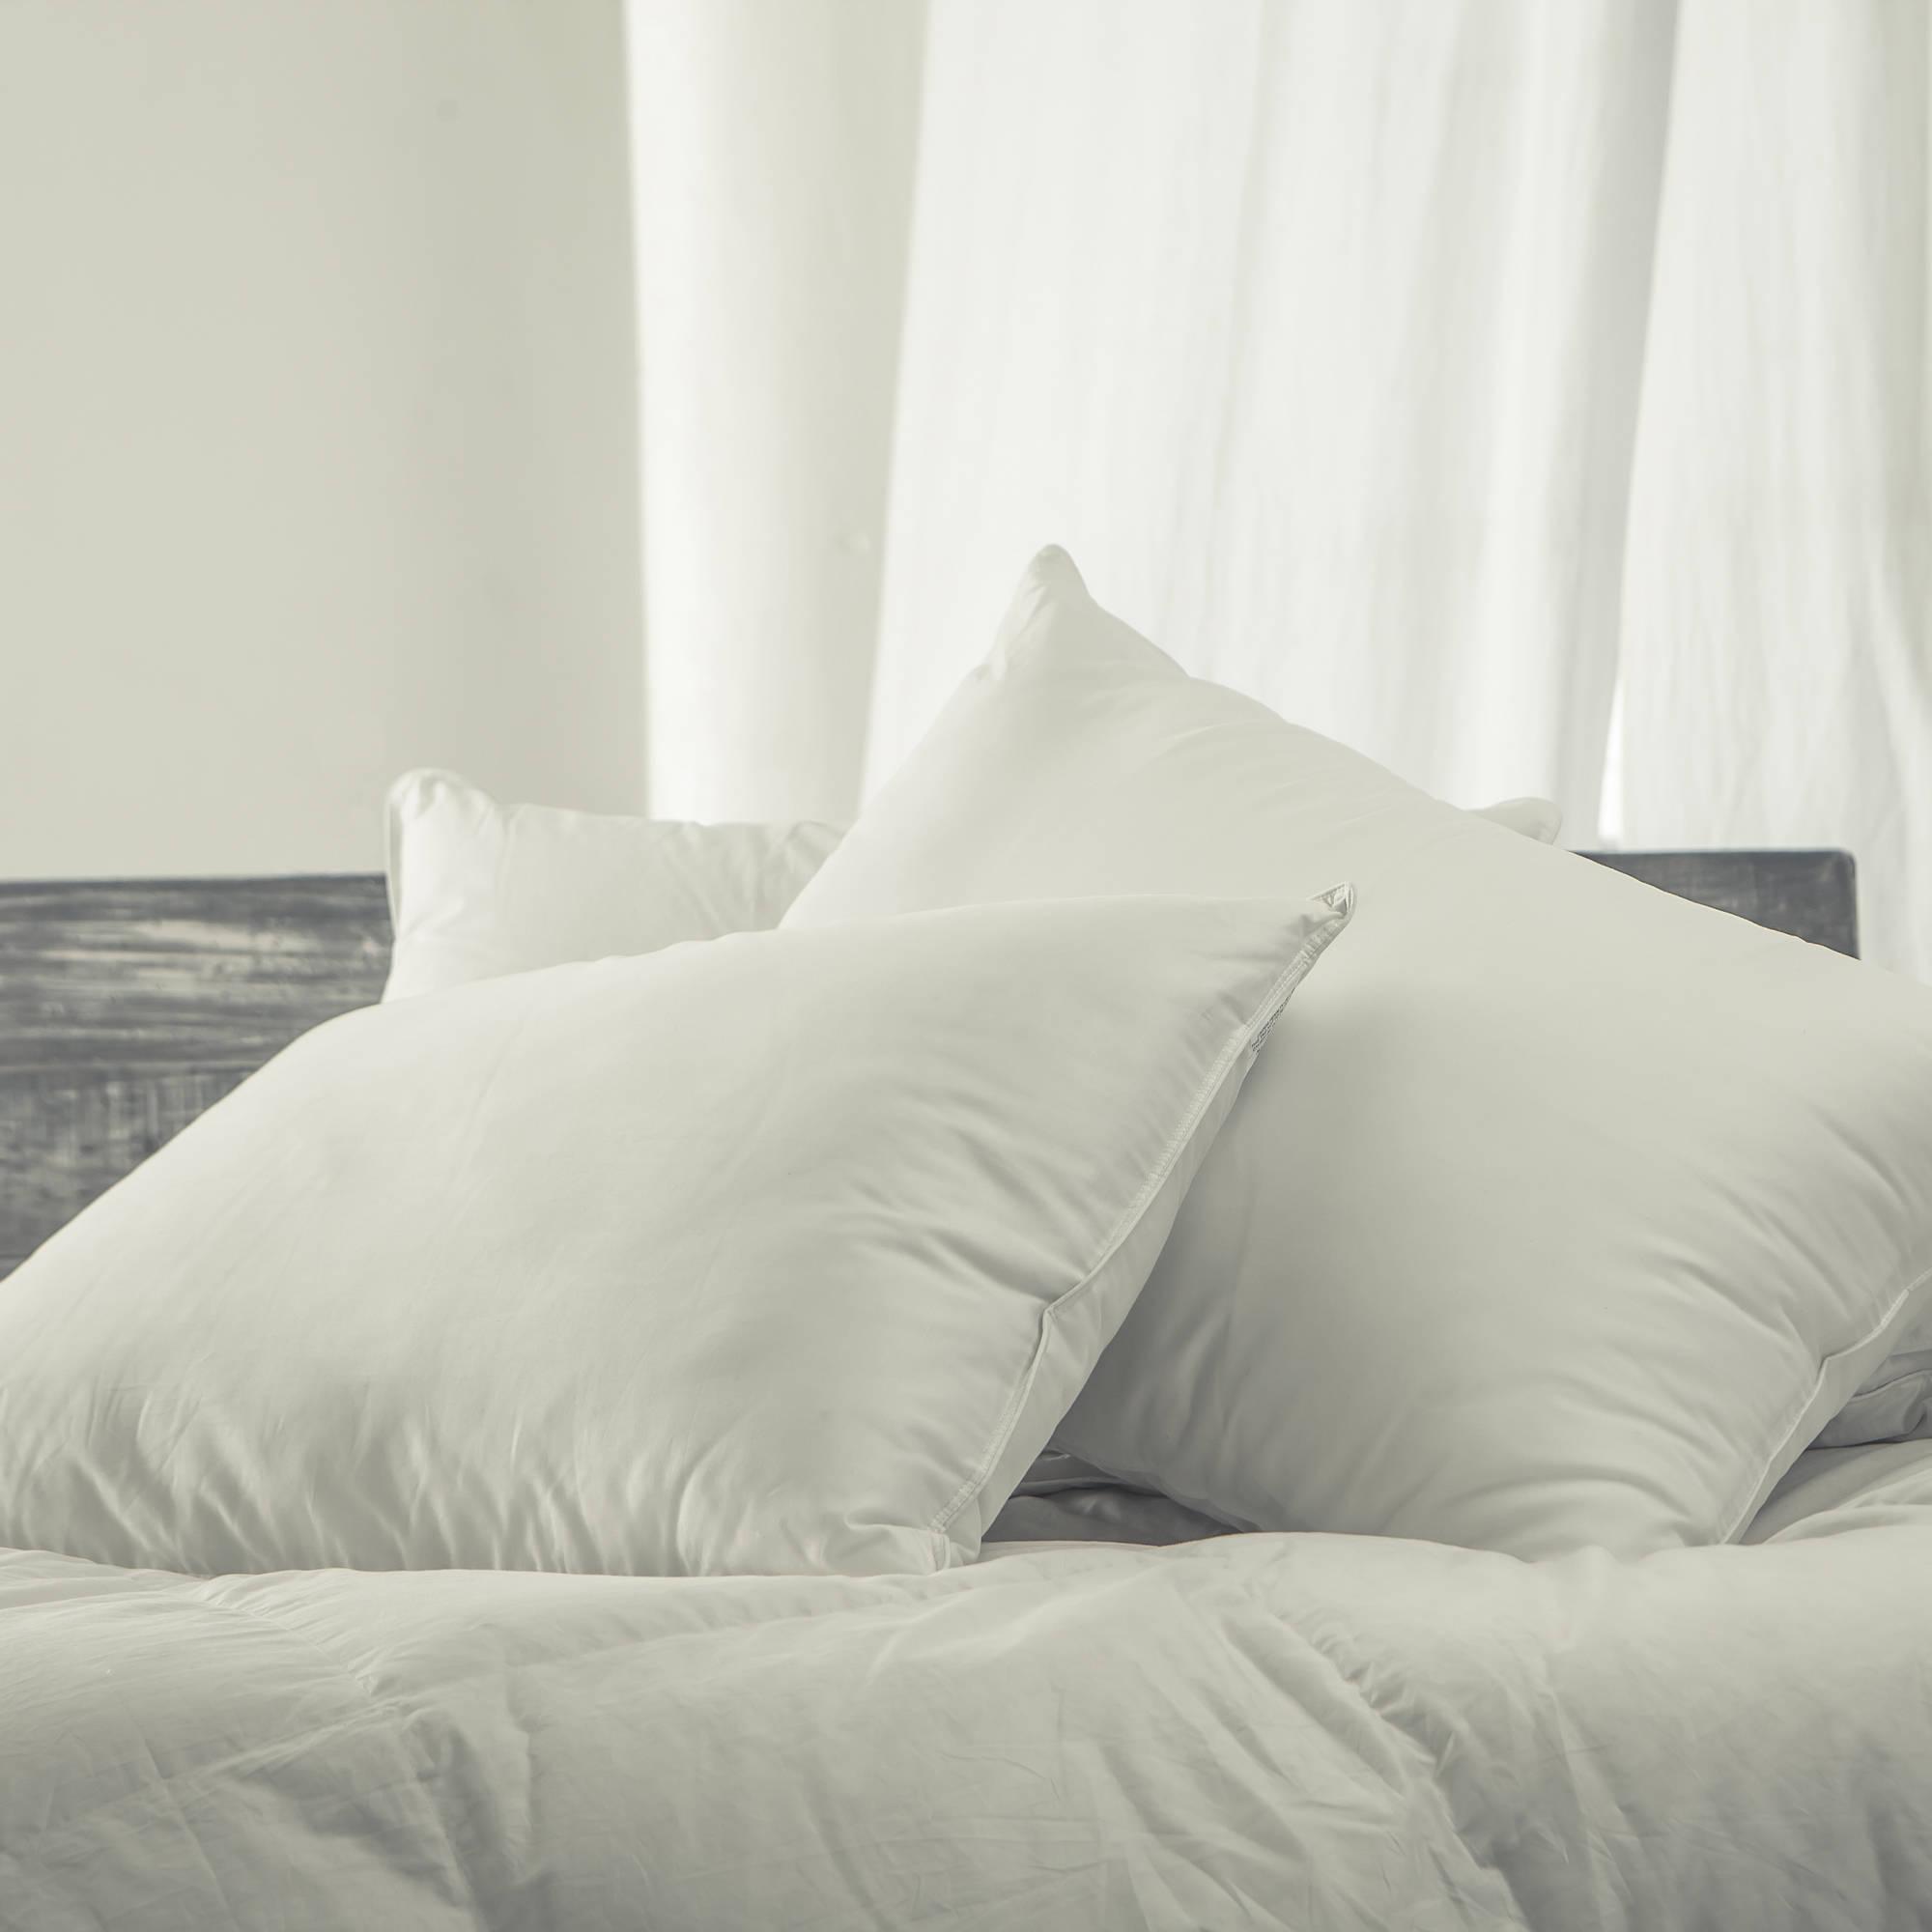 Cozy Classics Dacron Comforel Silky Medium Down Alternative Pillows, 2pk